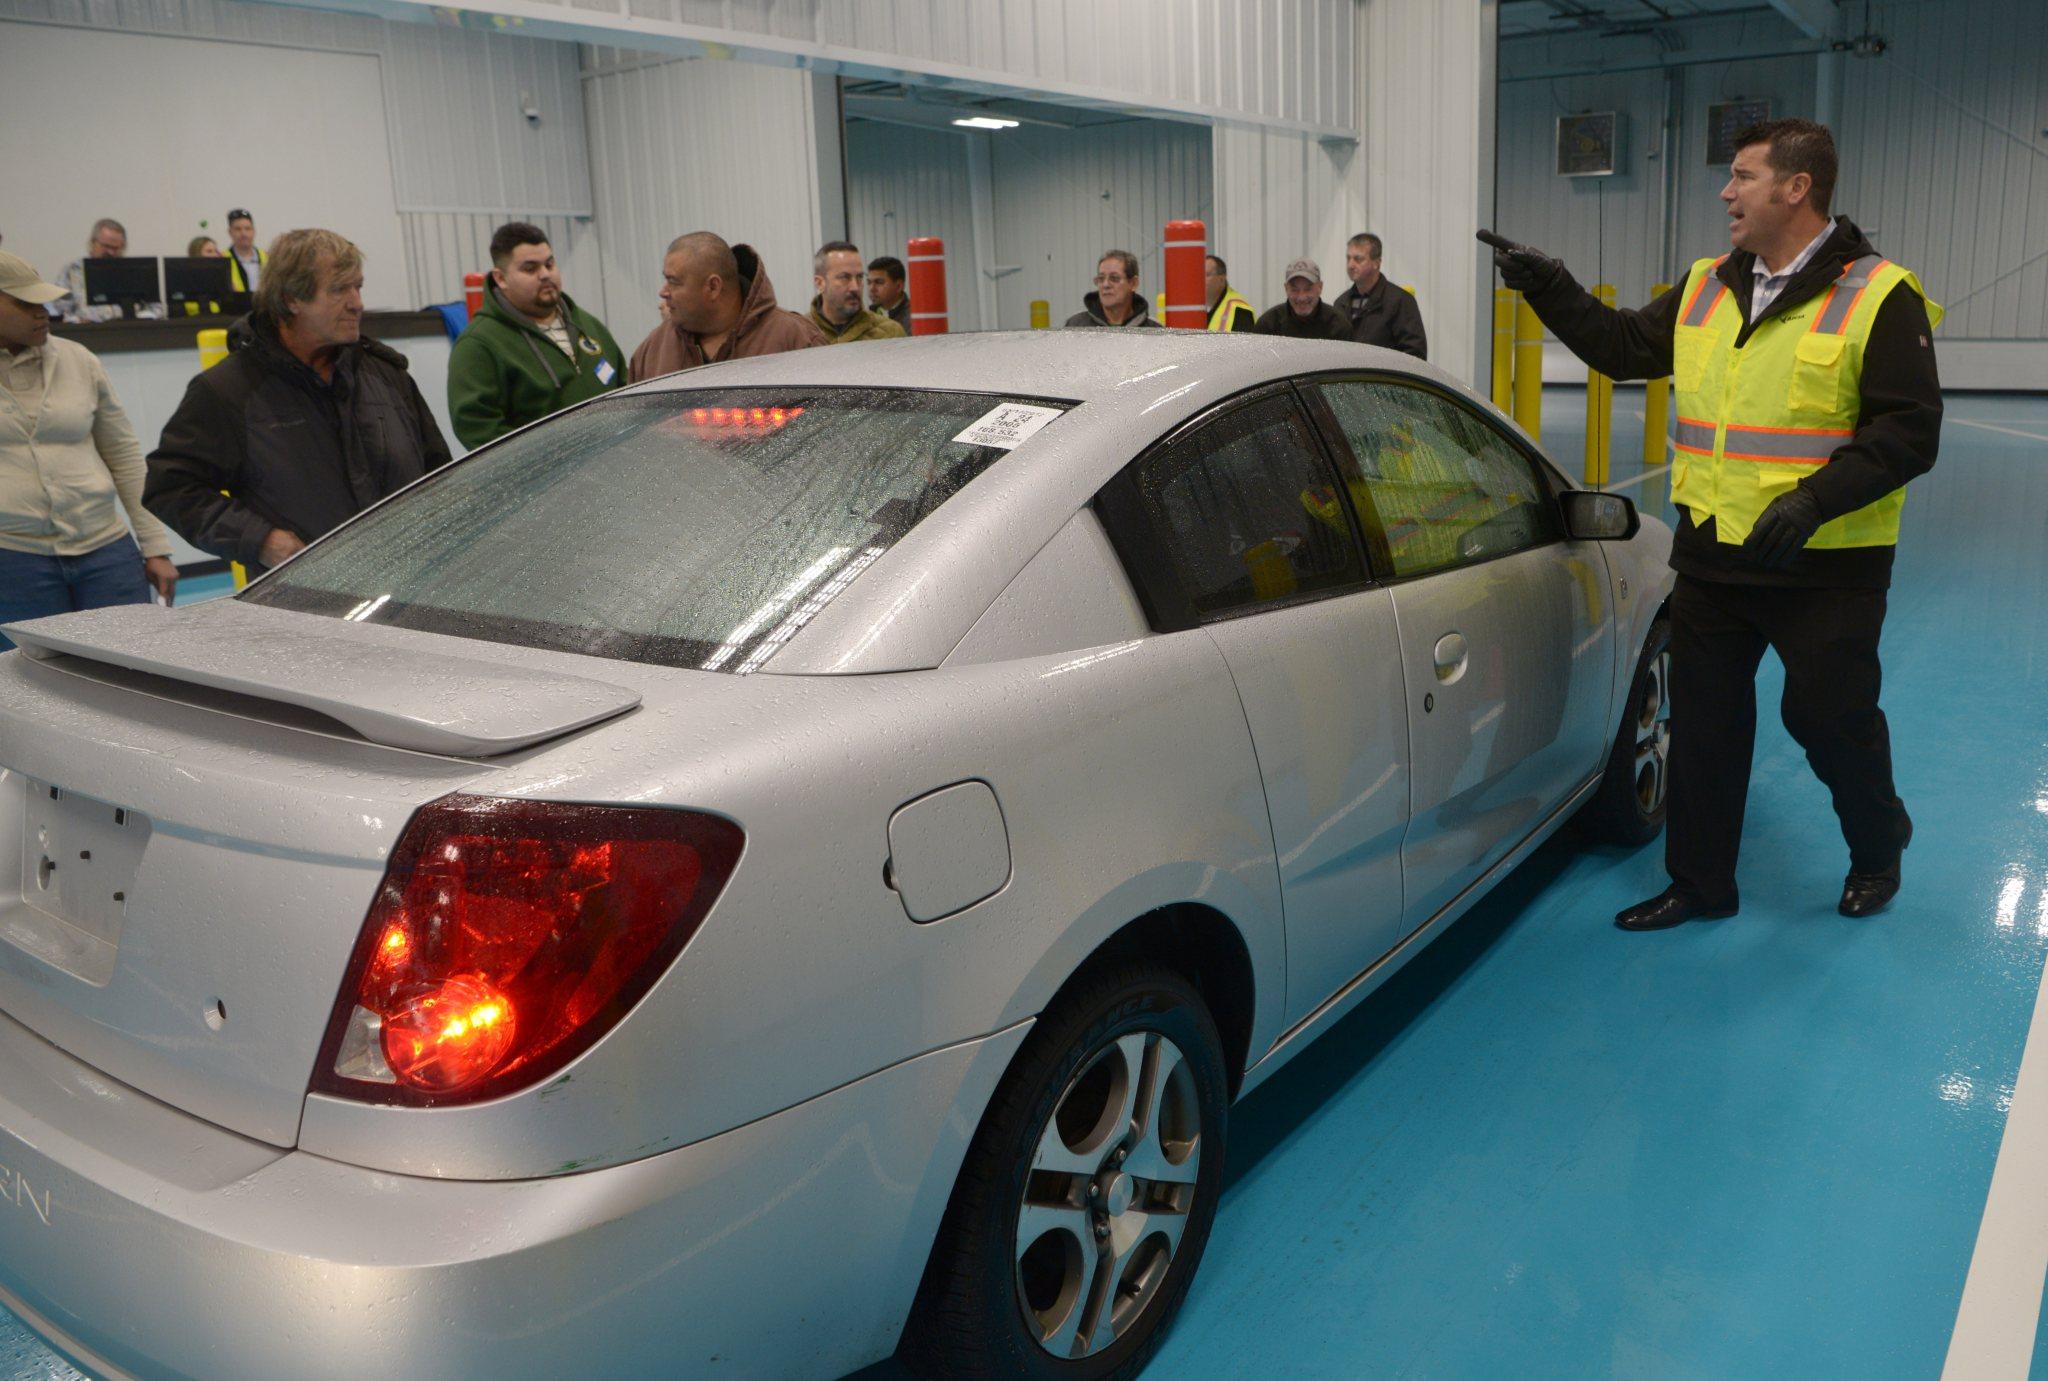 Hoffman Estates auto auction facility celebrates opening